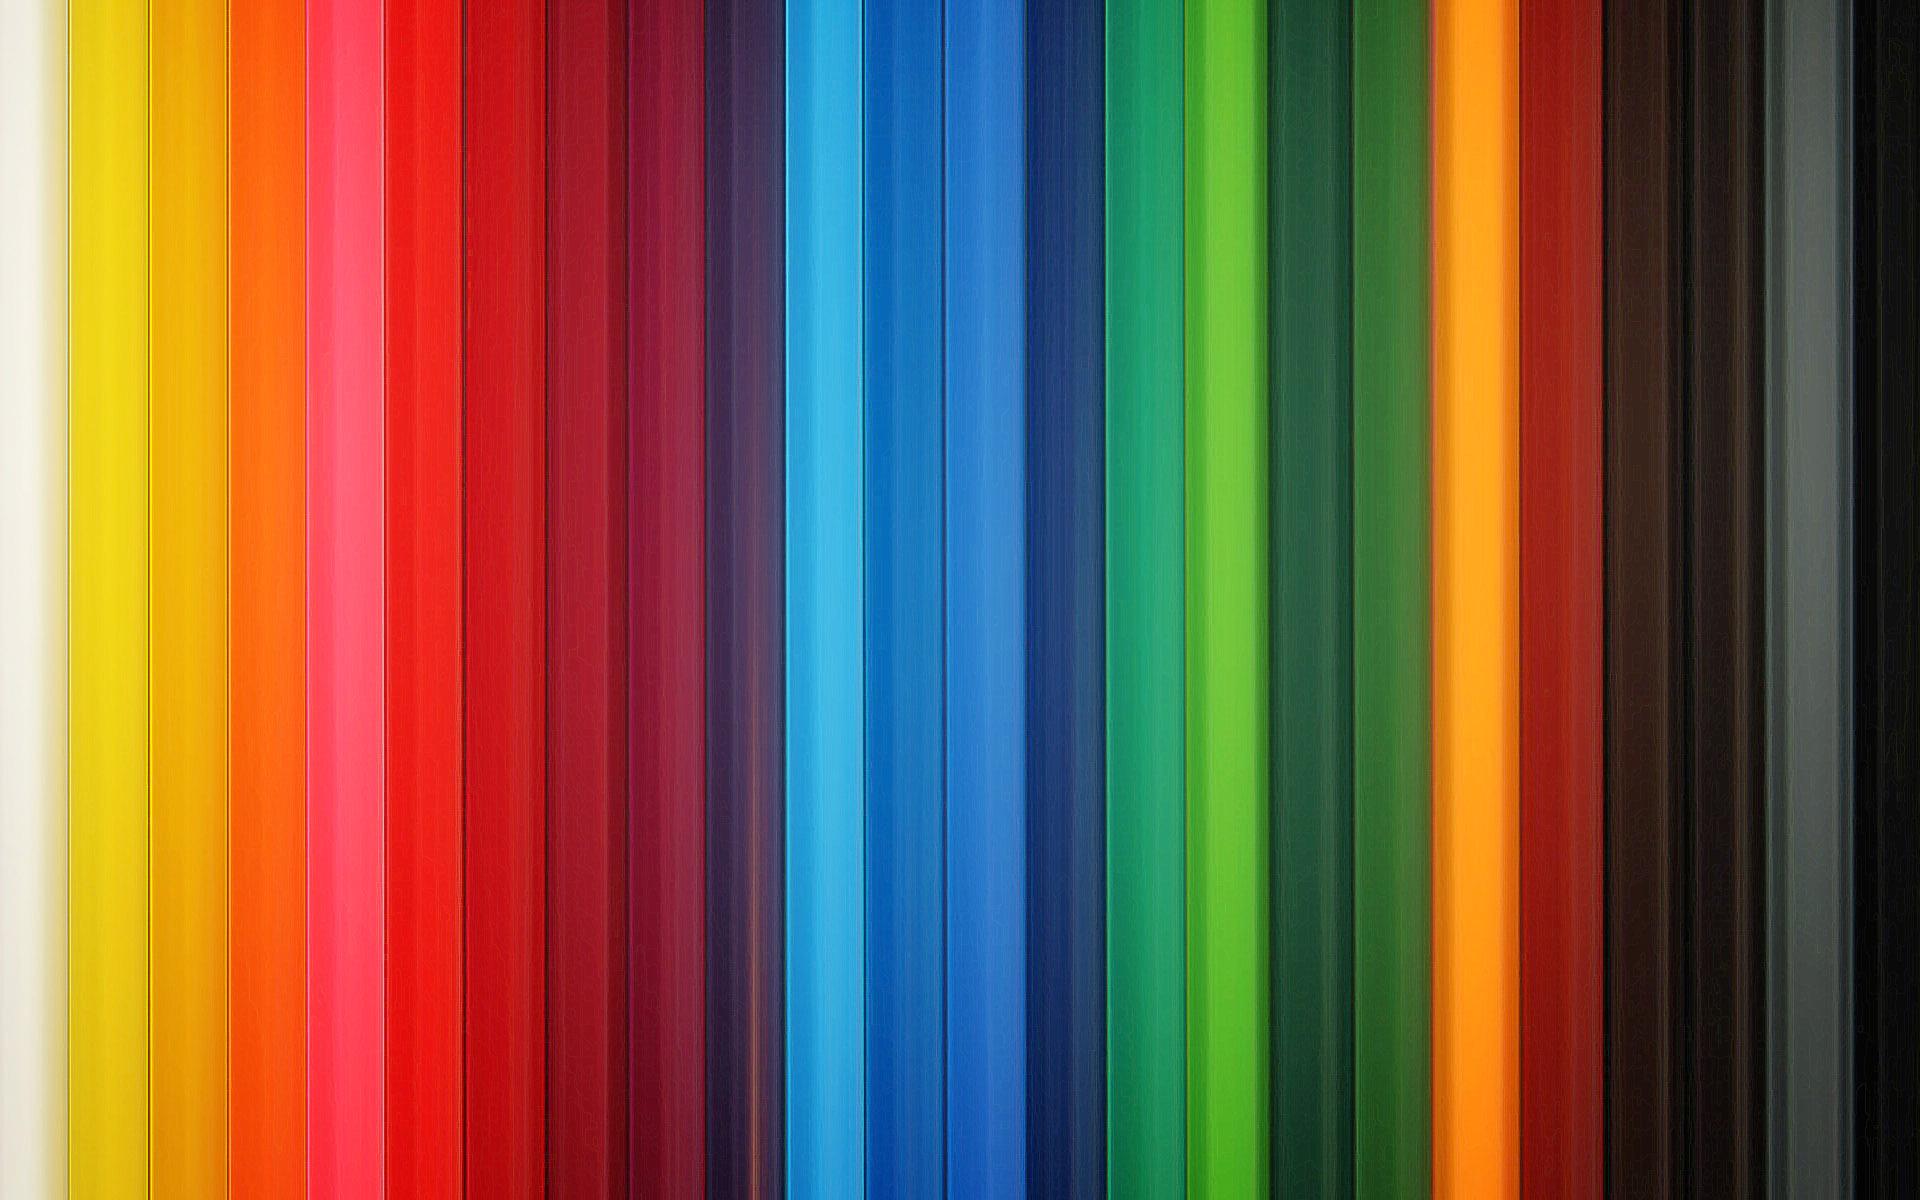 colorful wallpaper 1894